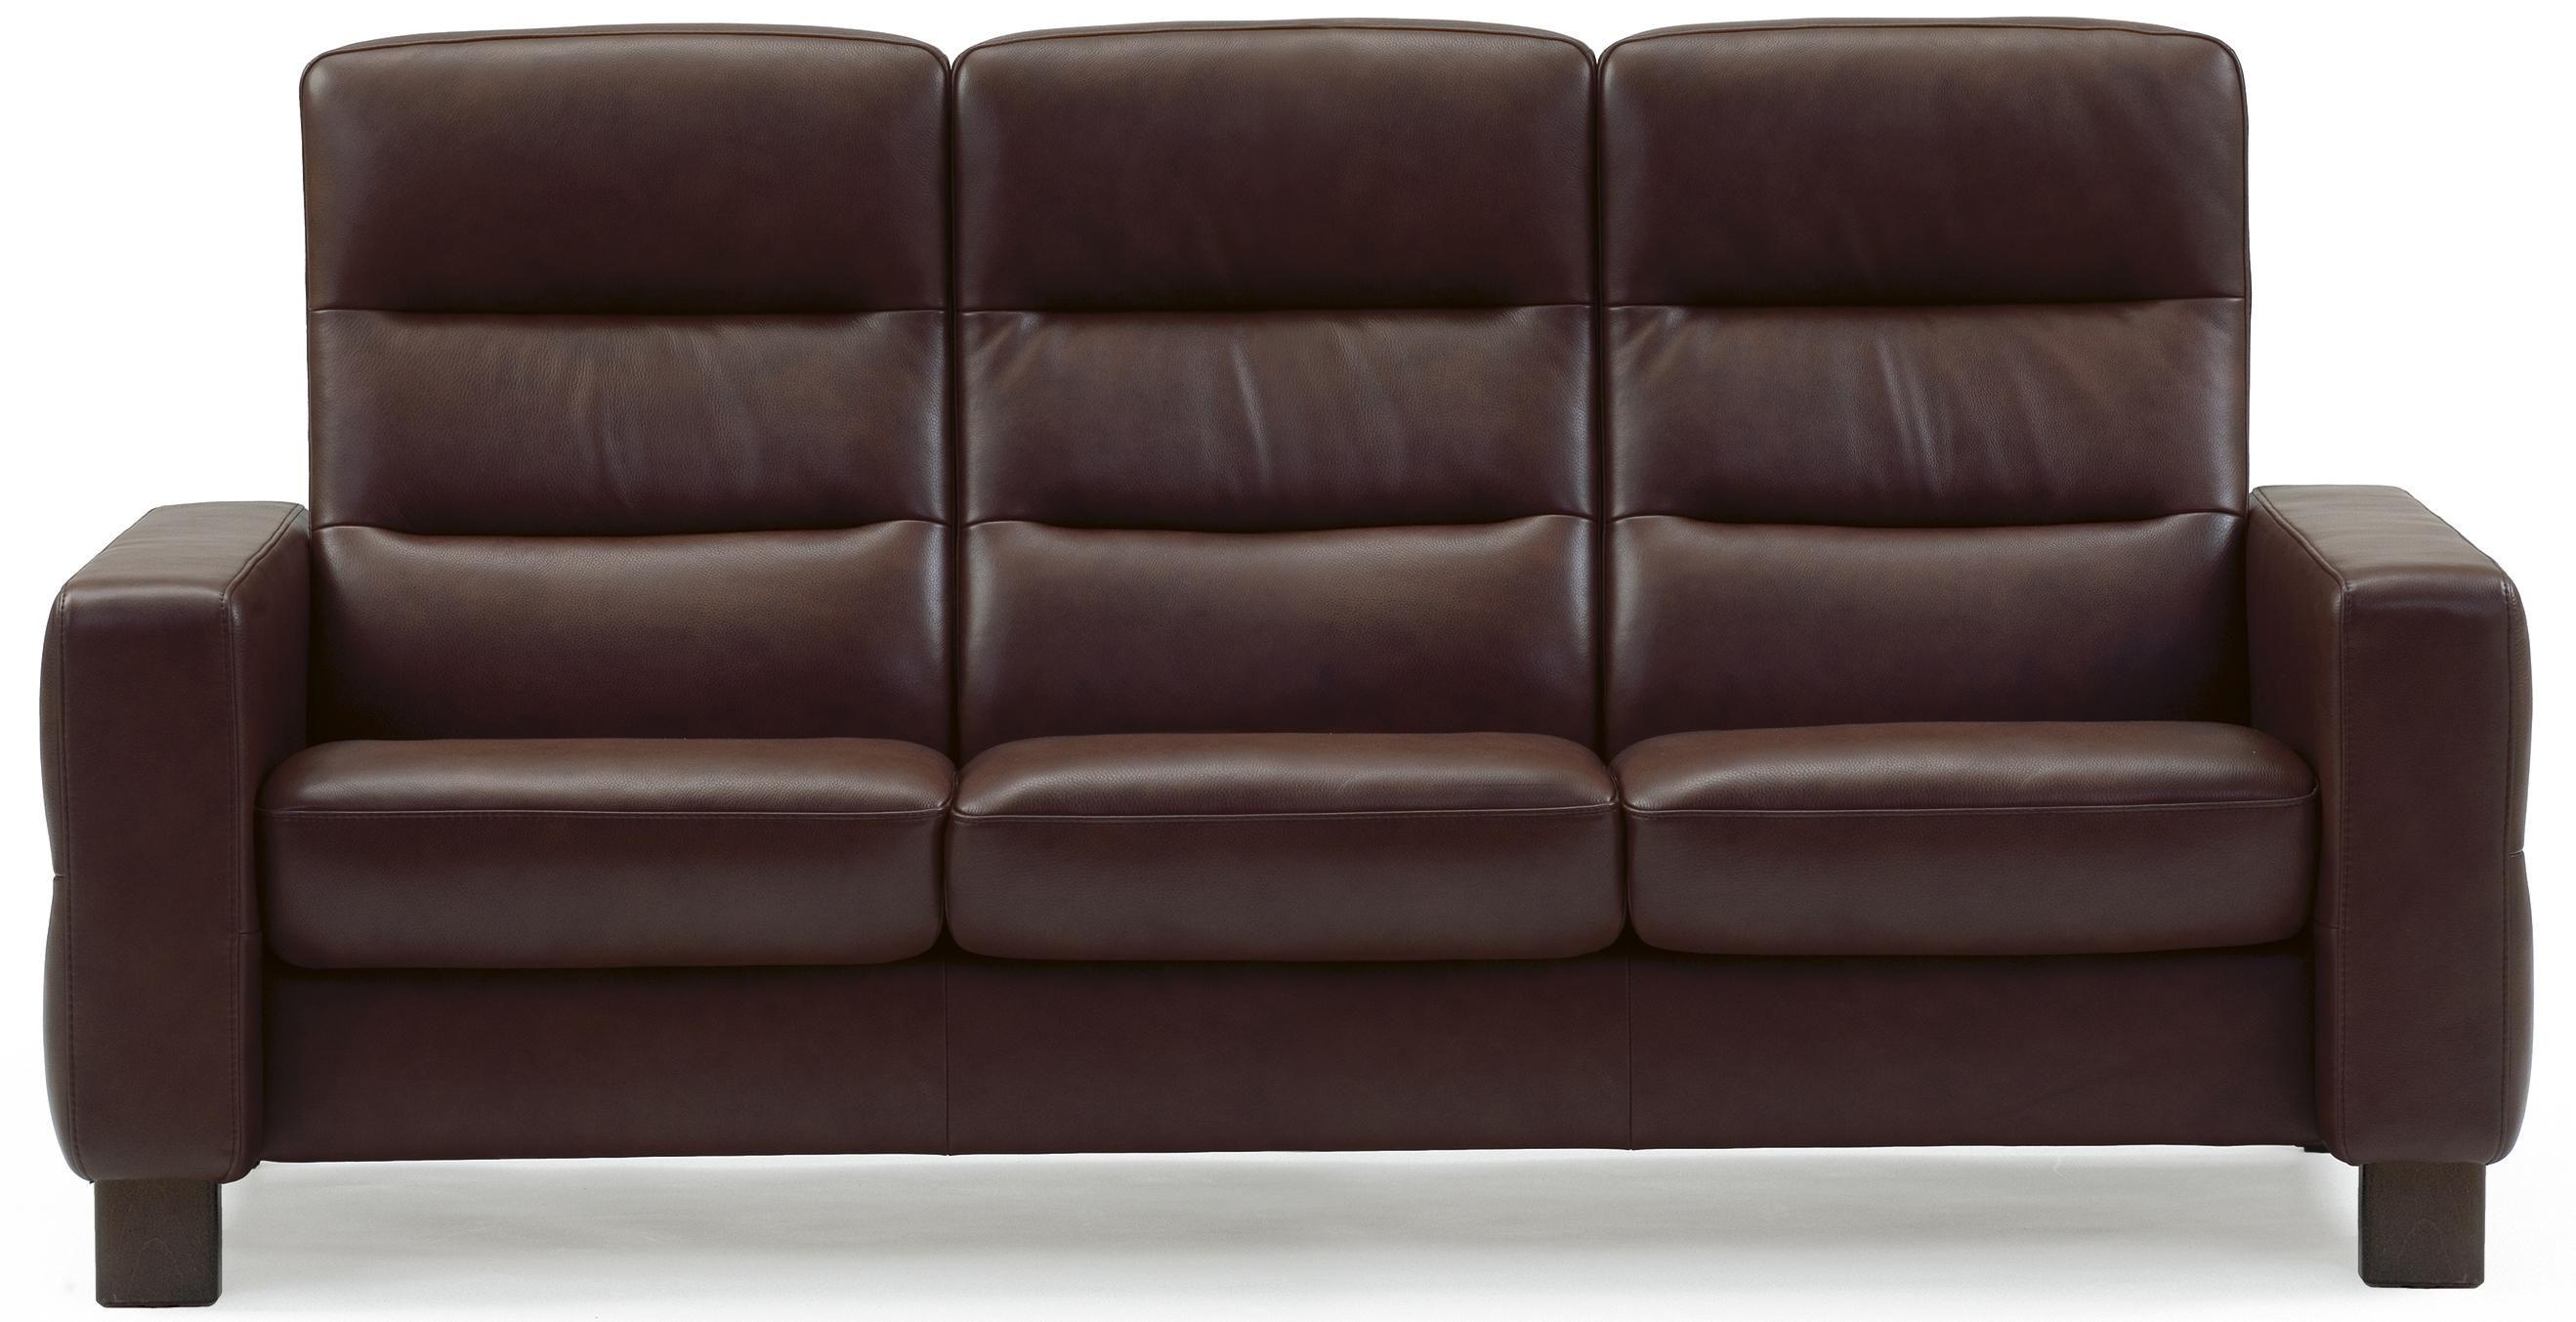 Marvelous Wave High Back Reclining Sofa By Stressless Love Your Creativecarmelina Interior Chair Design Creativecarmelinacom